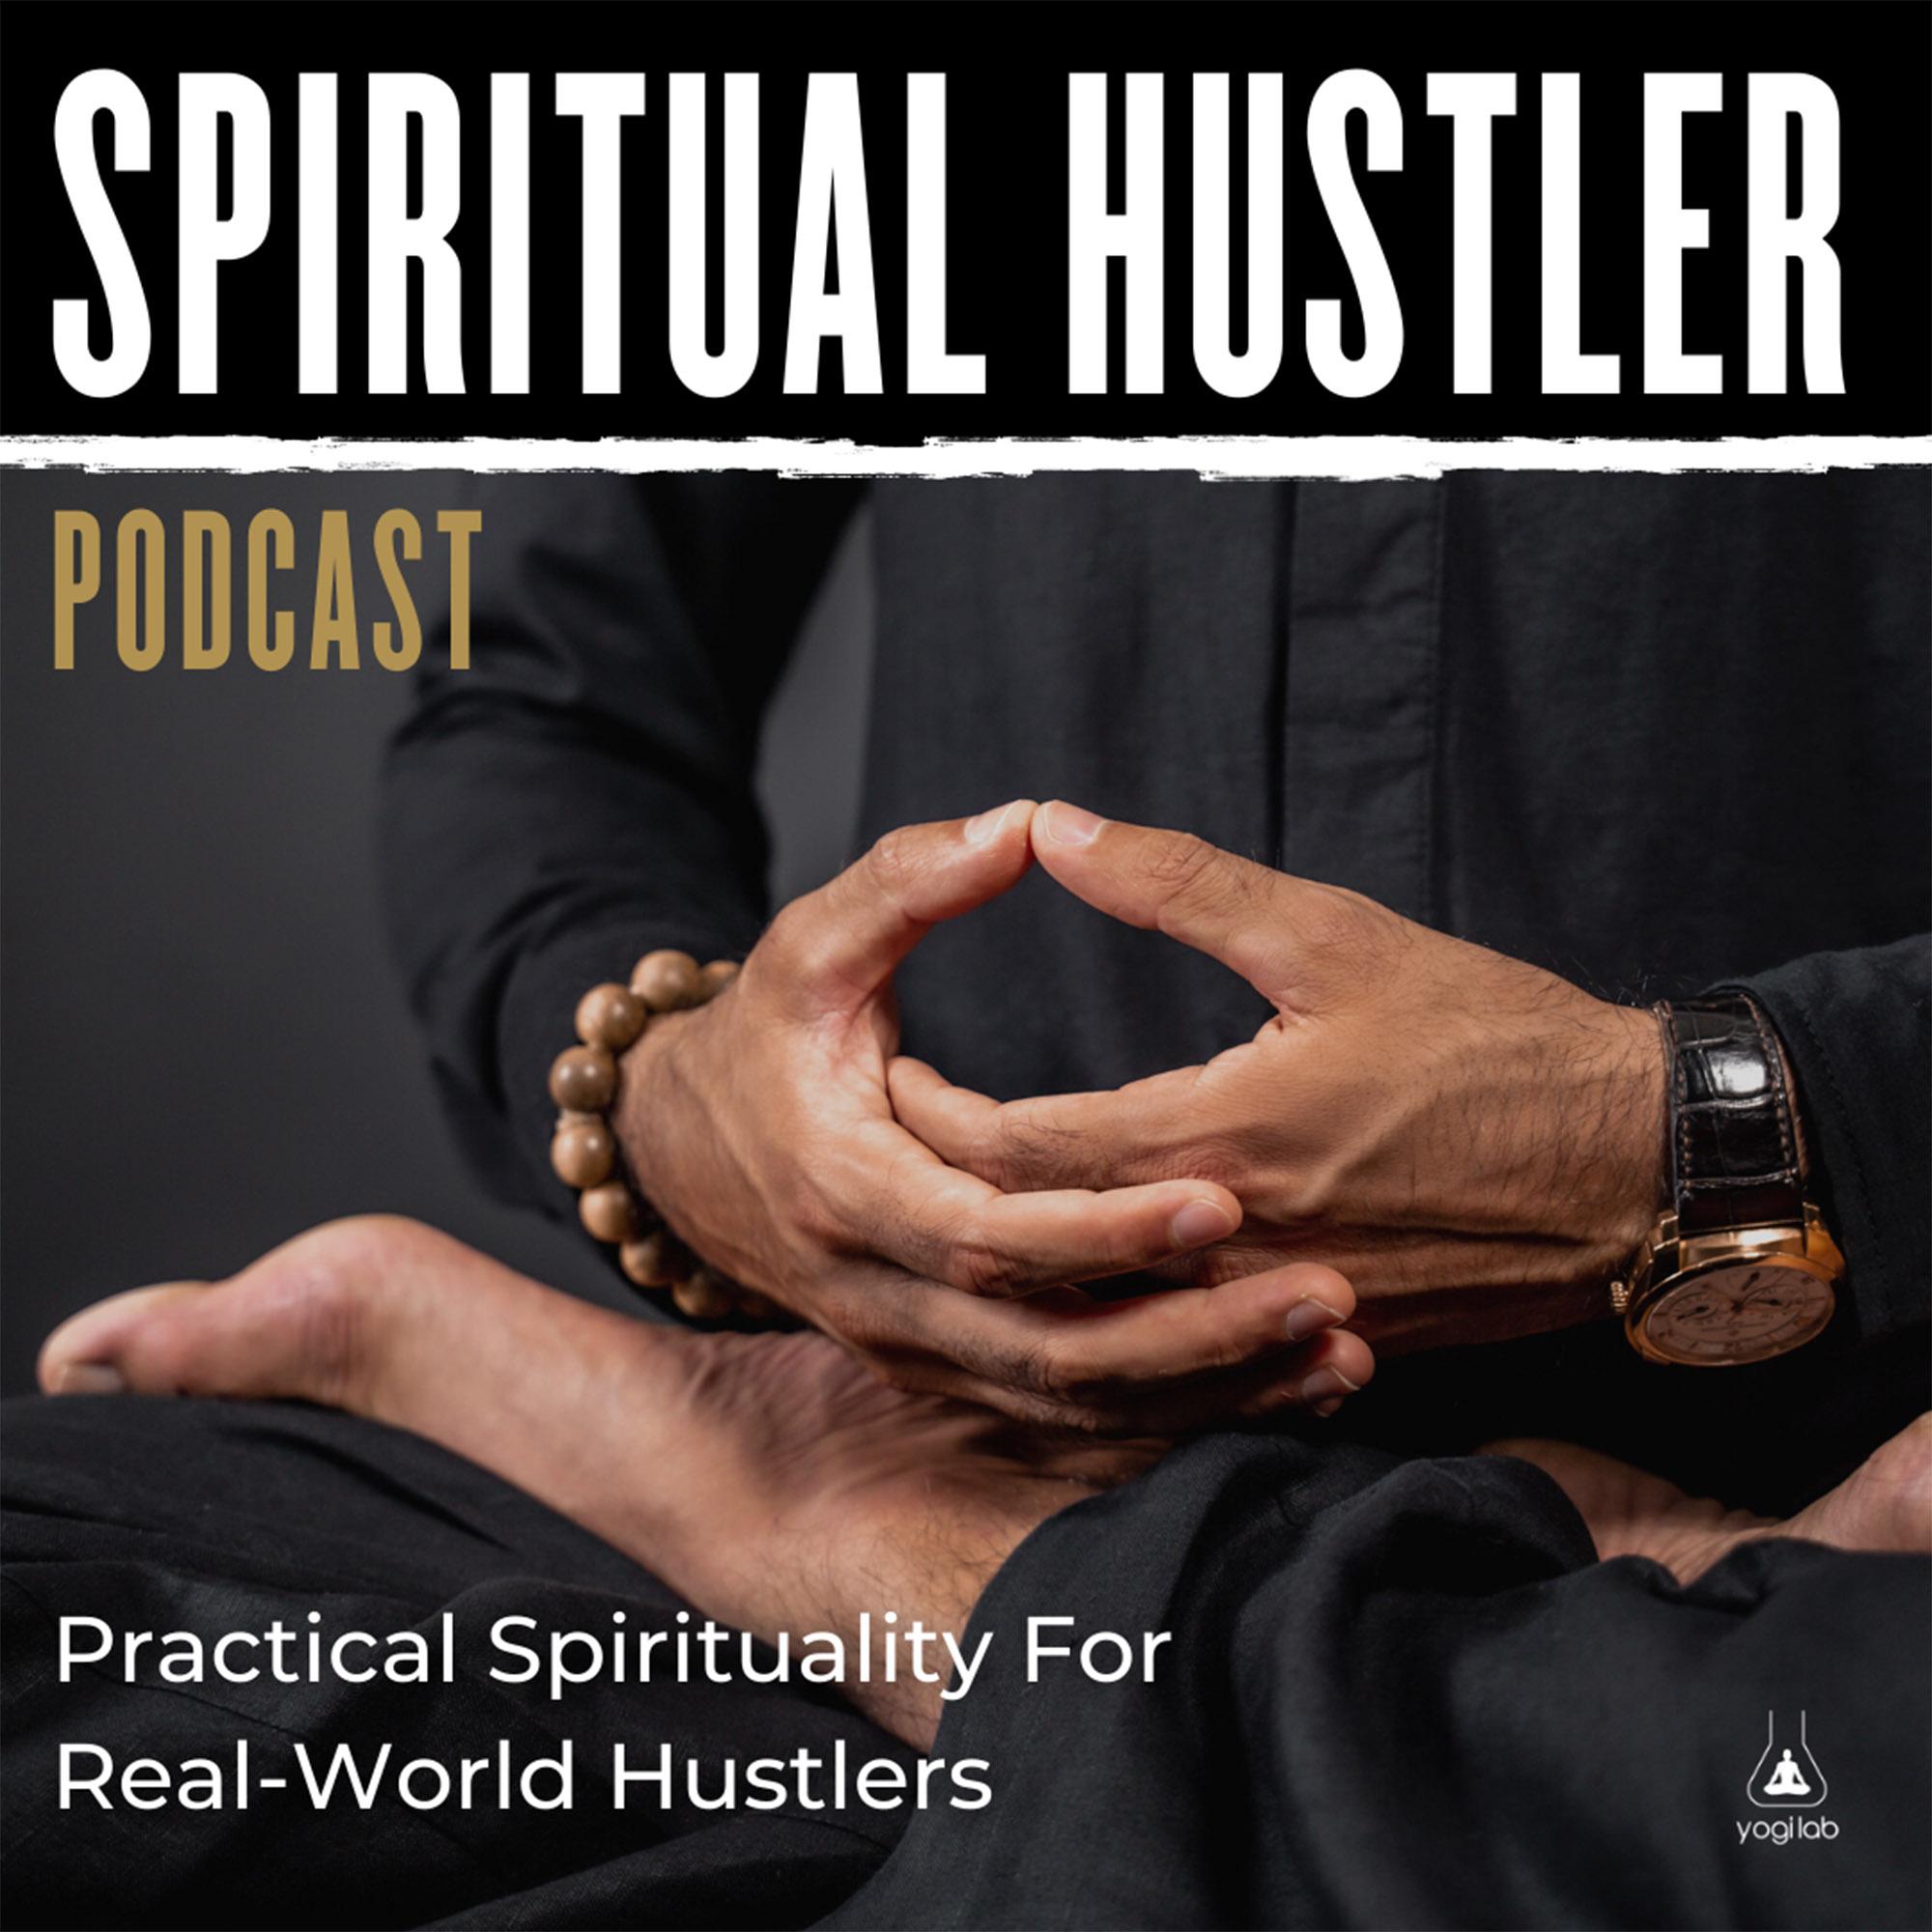 #43 Jesse Wynyard | Spiritual Hustler Podcast | Practical Spirituality For Real World Hustlers